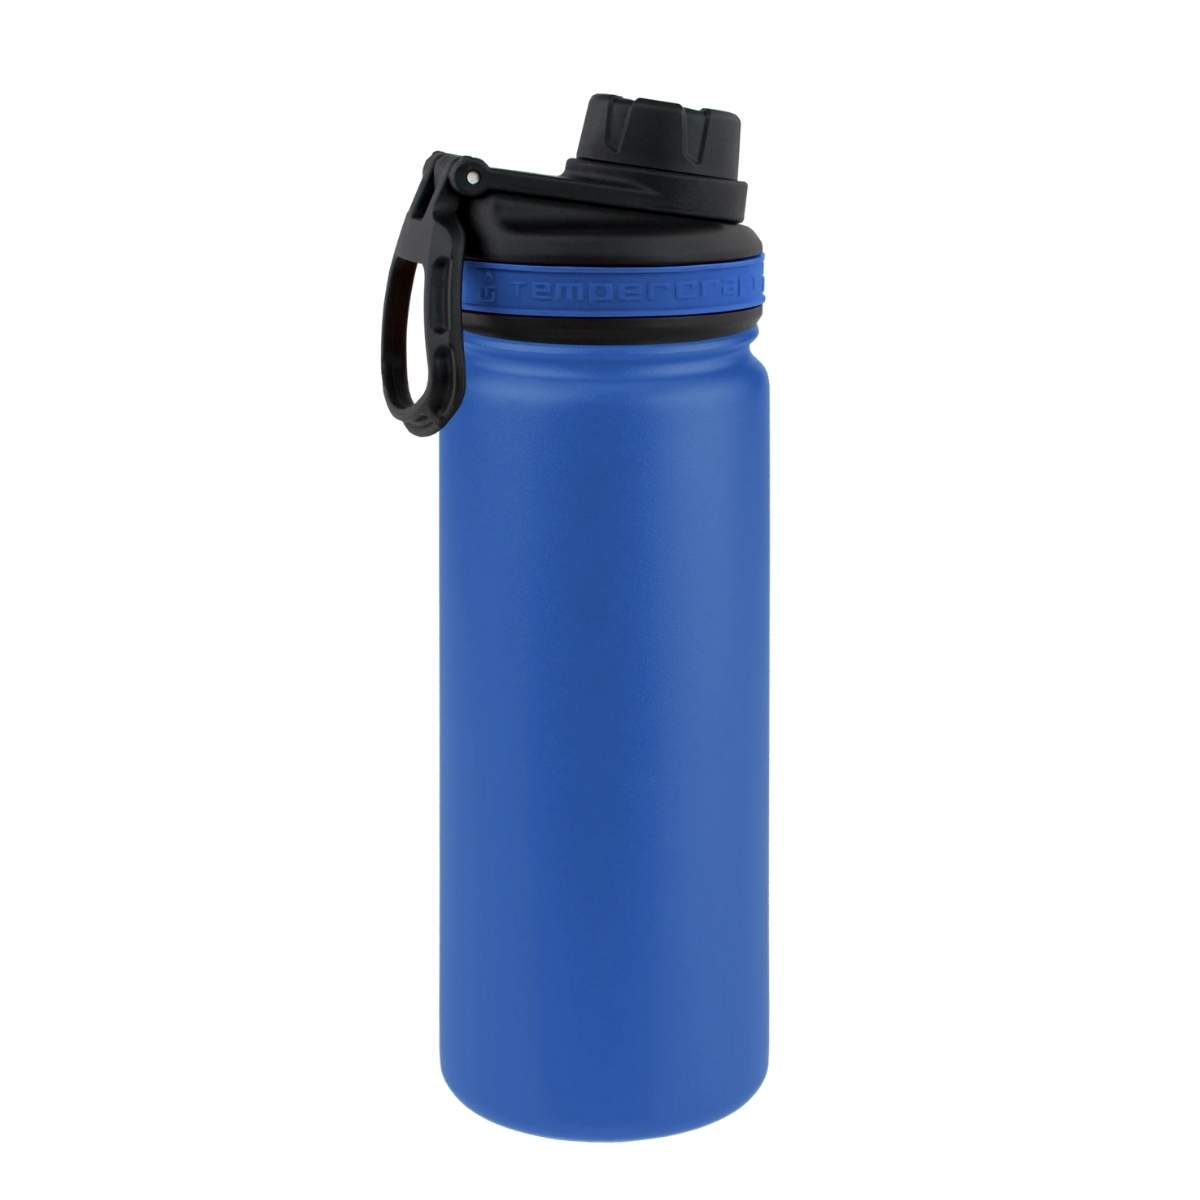 Tempercraft 18 oz. Water Bottle